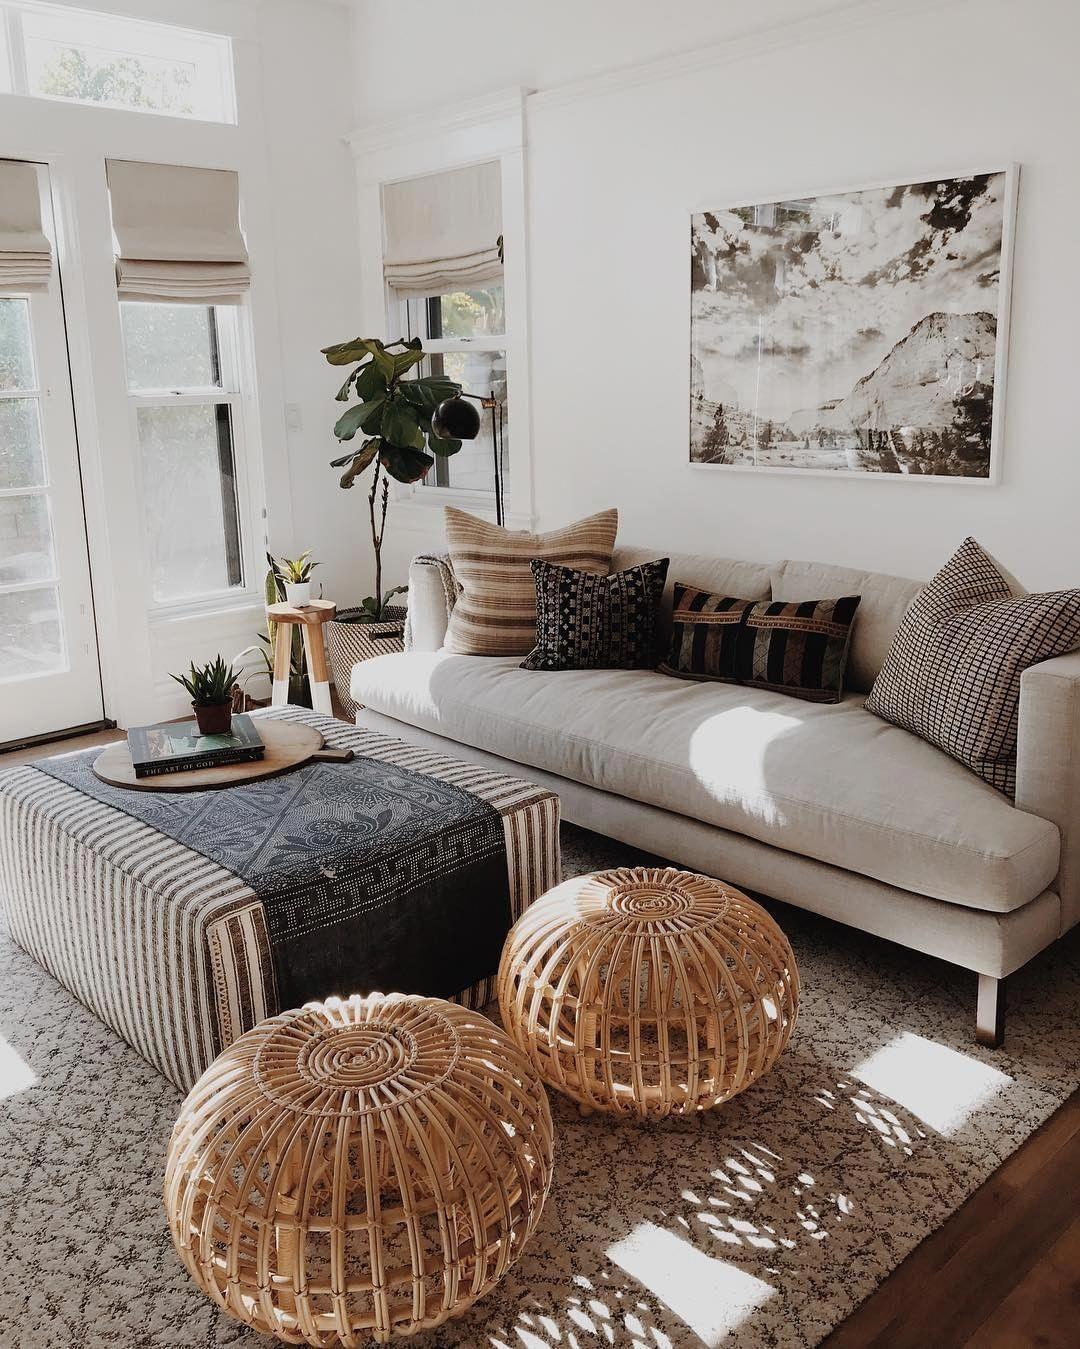 The Home Decor Group #Khomedecorlovers